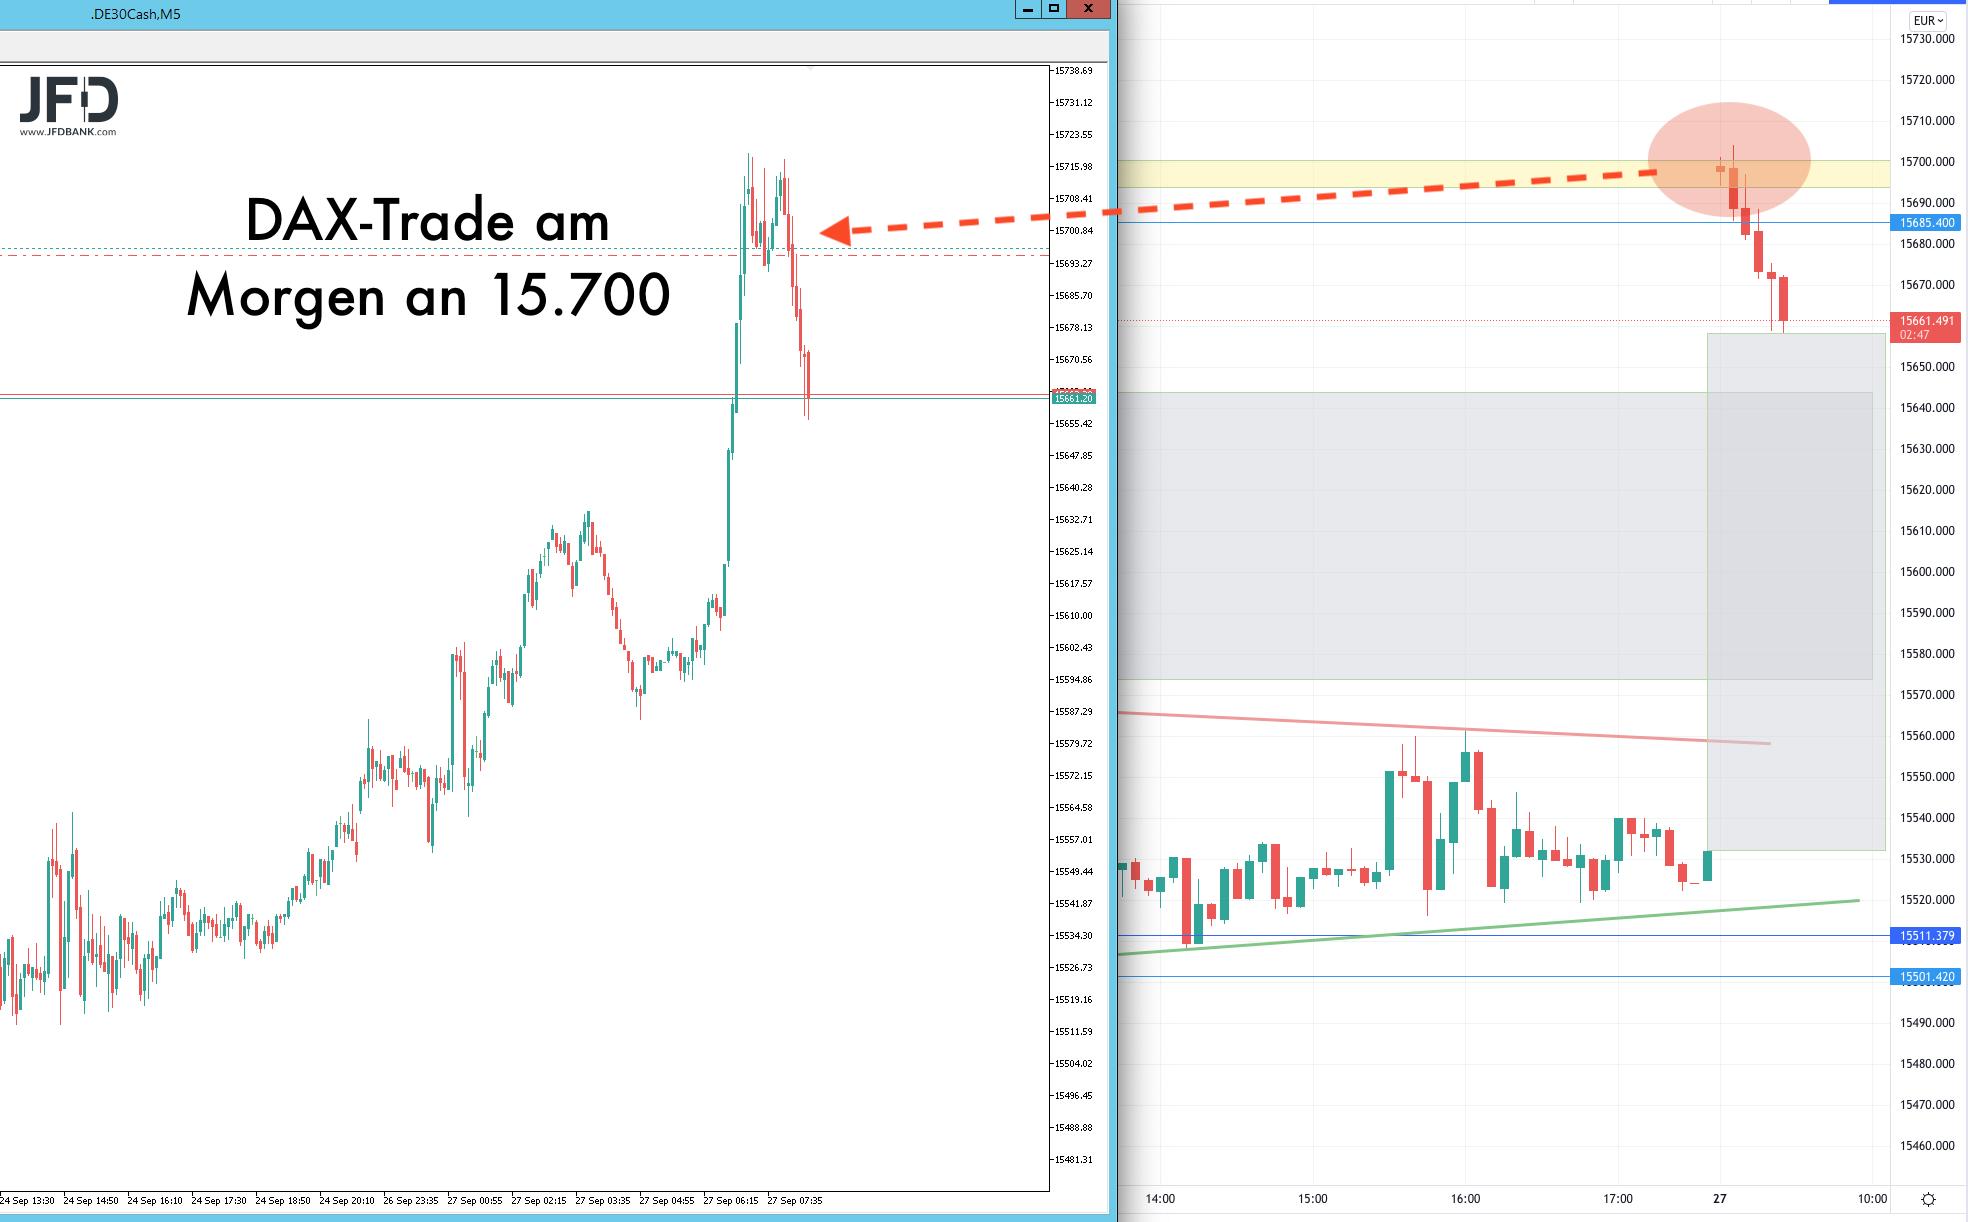 DAX-Trade am 27.09.2021